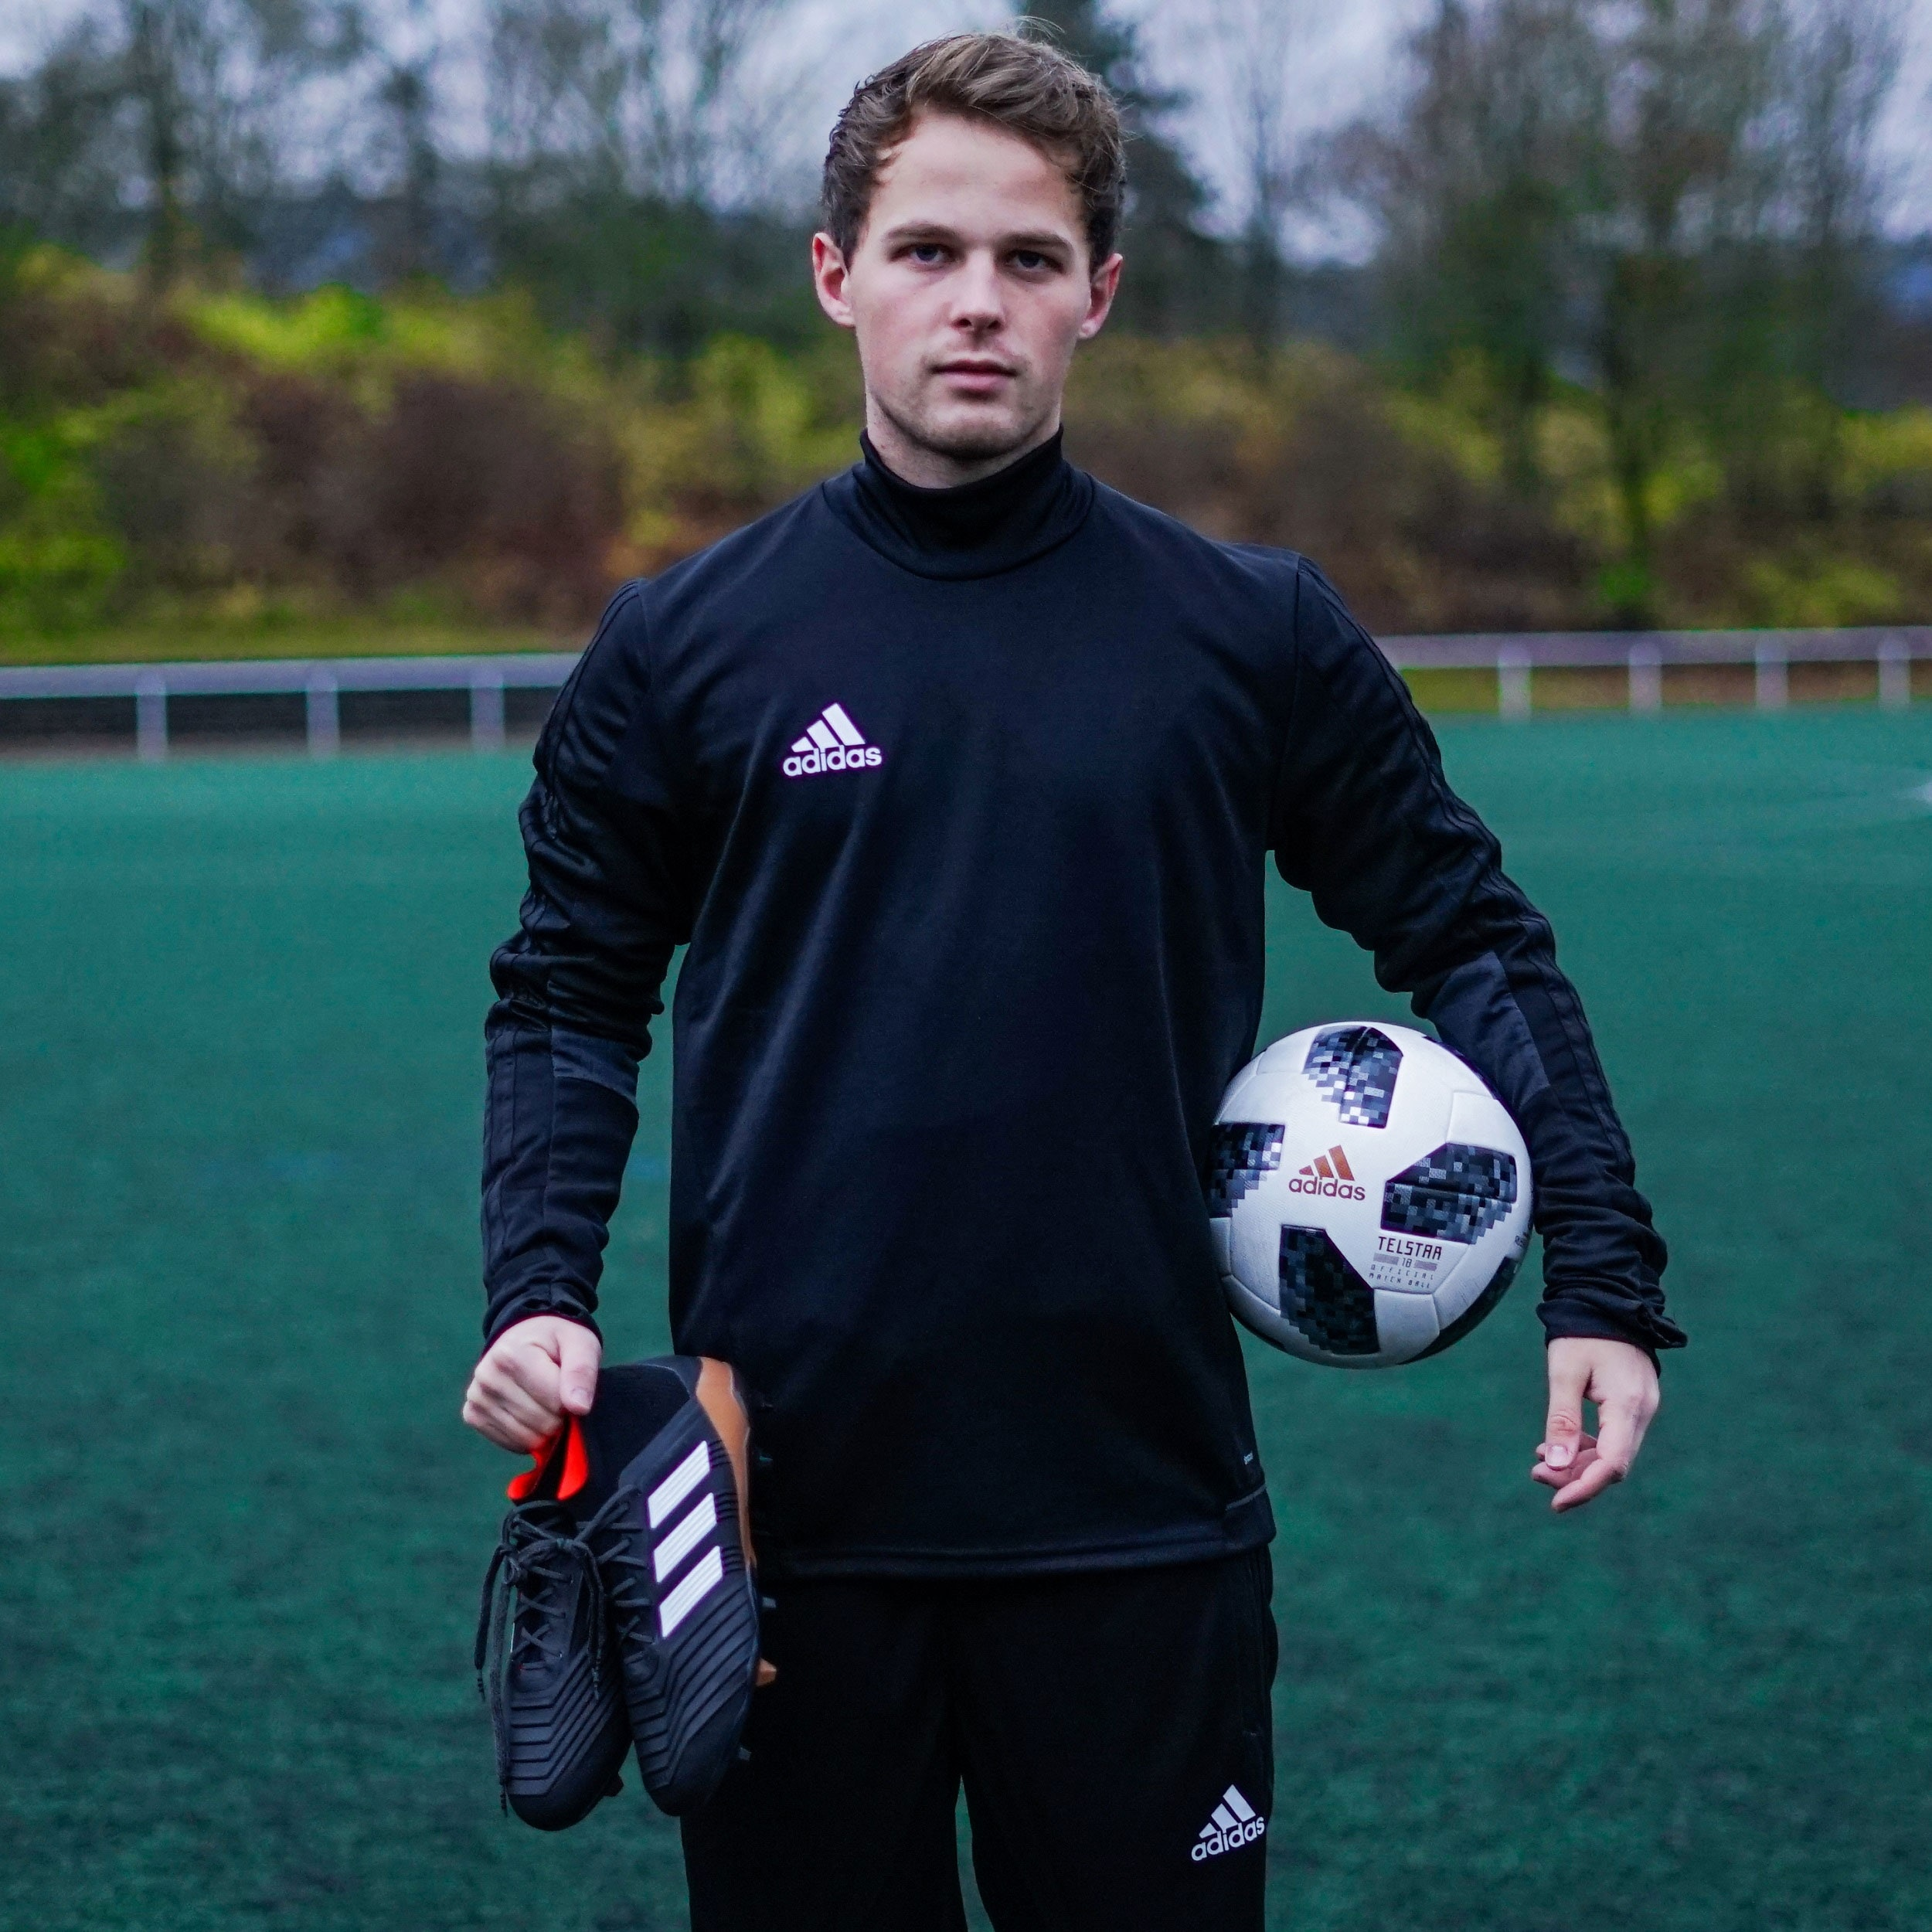 Lukasfootball mit dem adidas predator